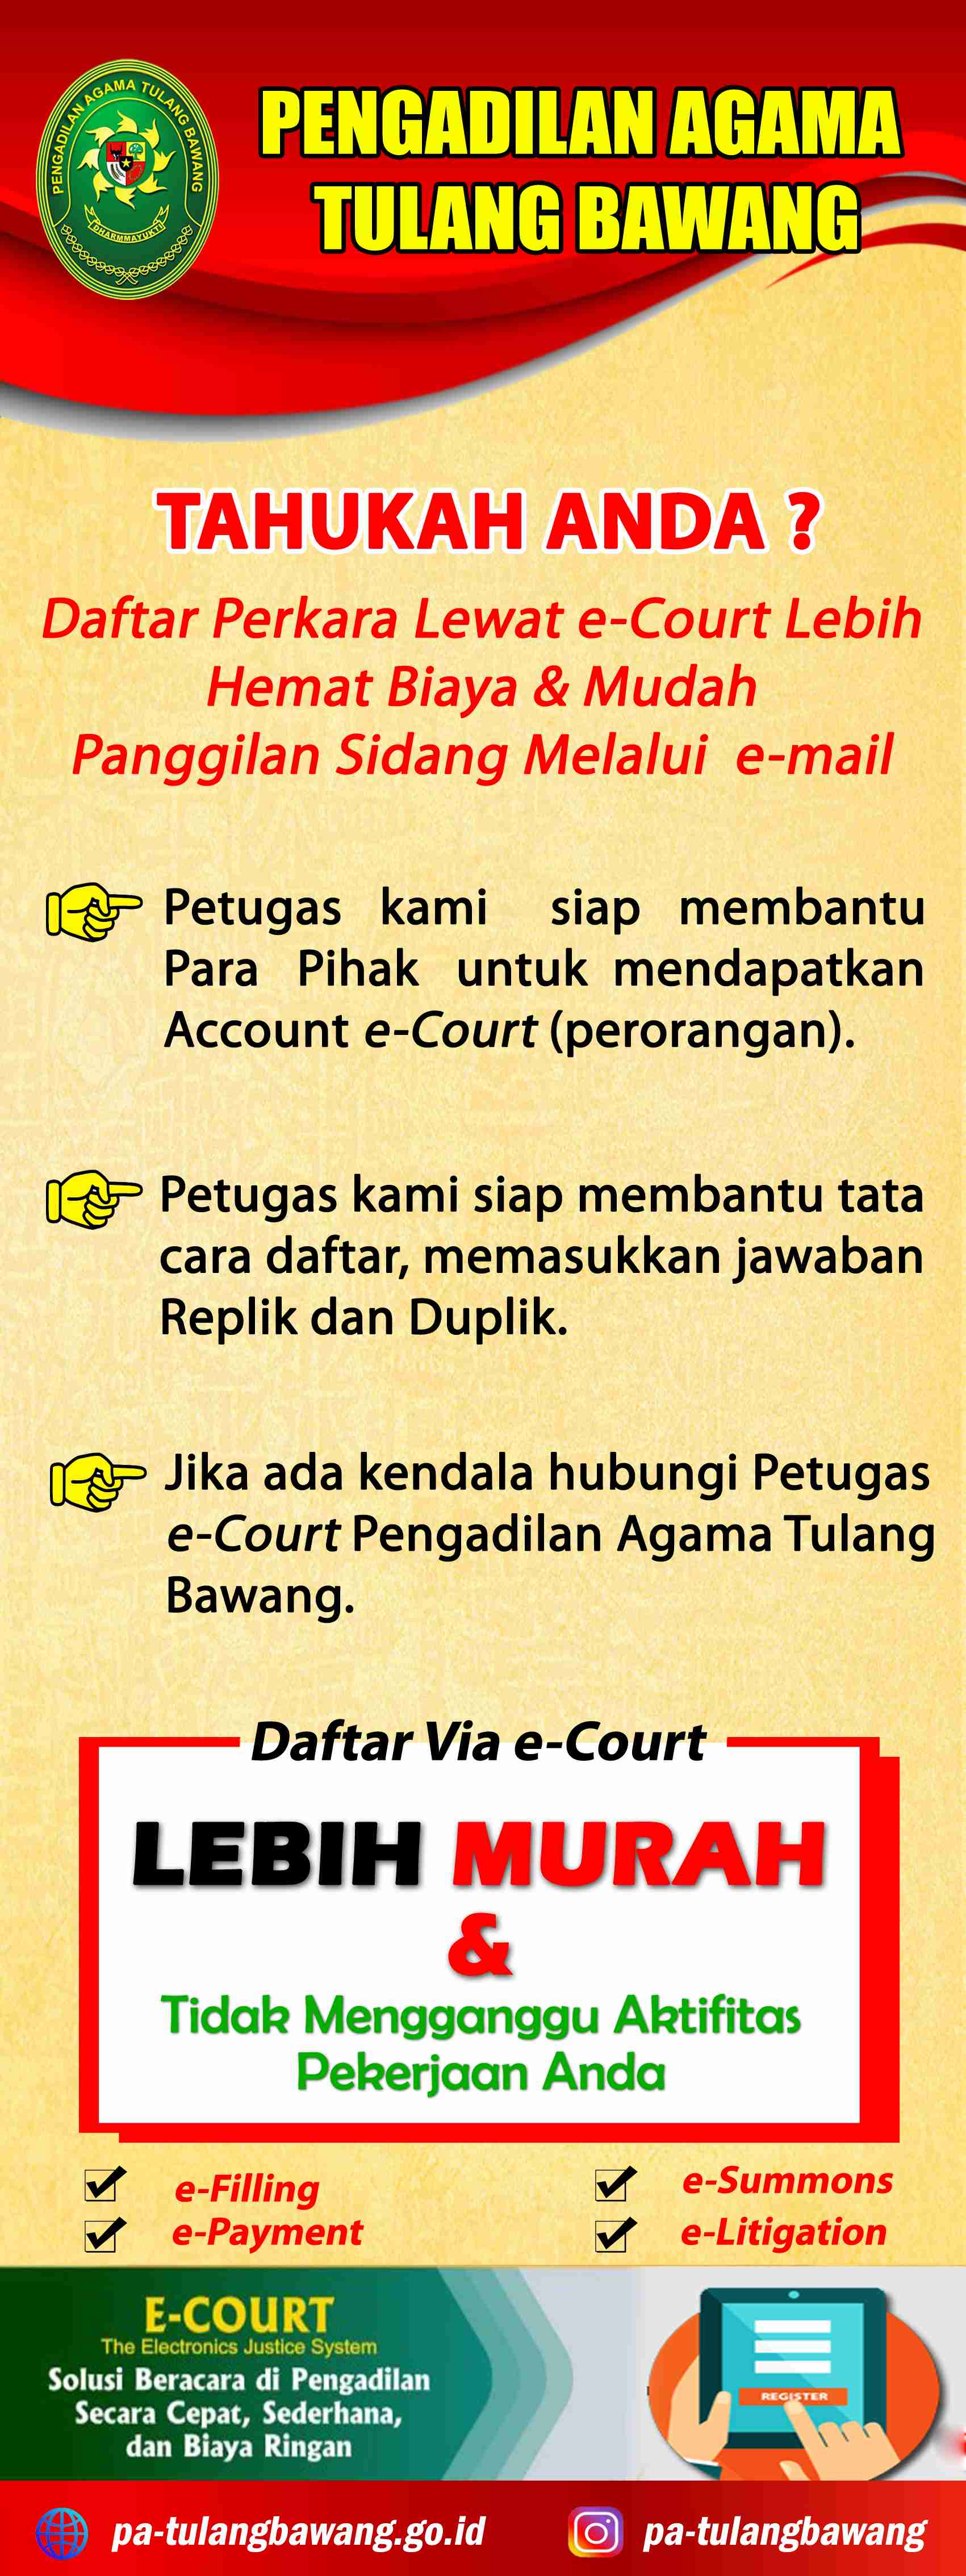 Pendaftaran online Pengadilan Agama Tulang Bawang